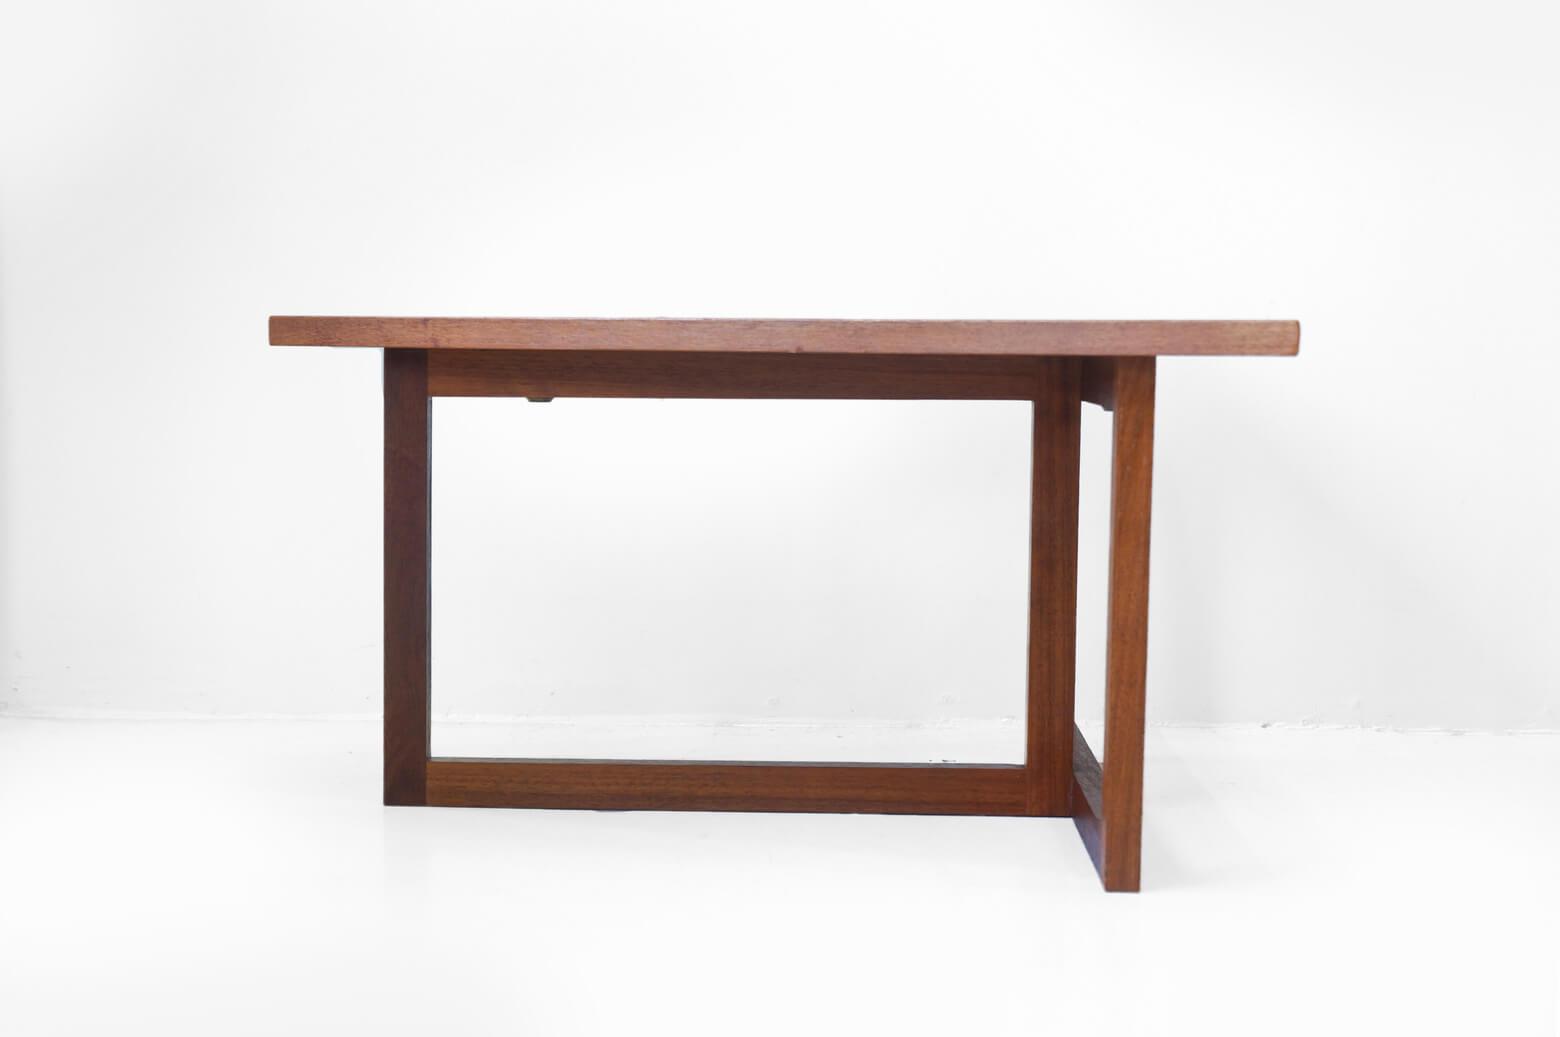 UK Vintage Teakwood Wedge Table/イギリス ヴィンテージ ウェッジテーブル